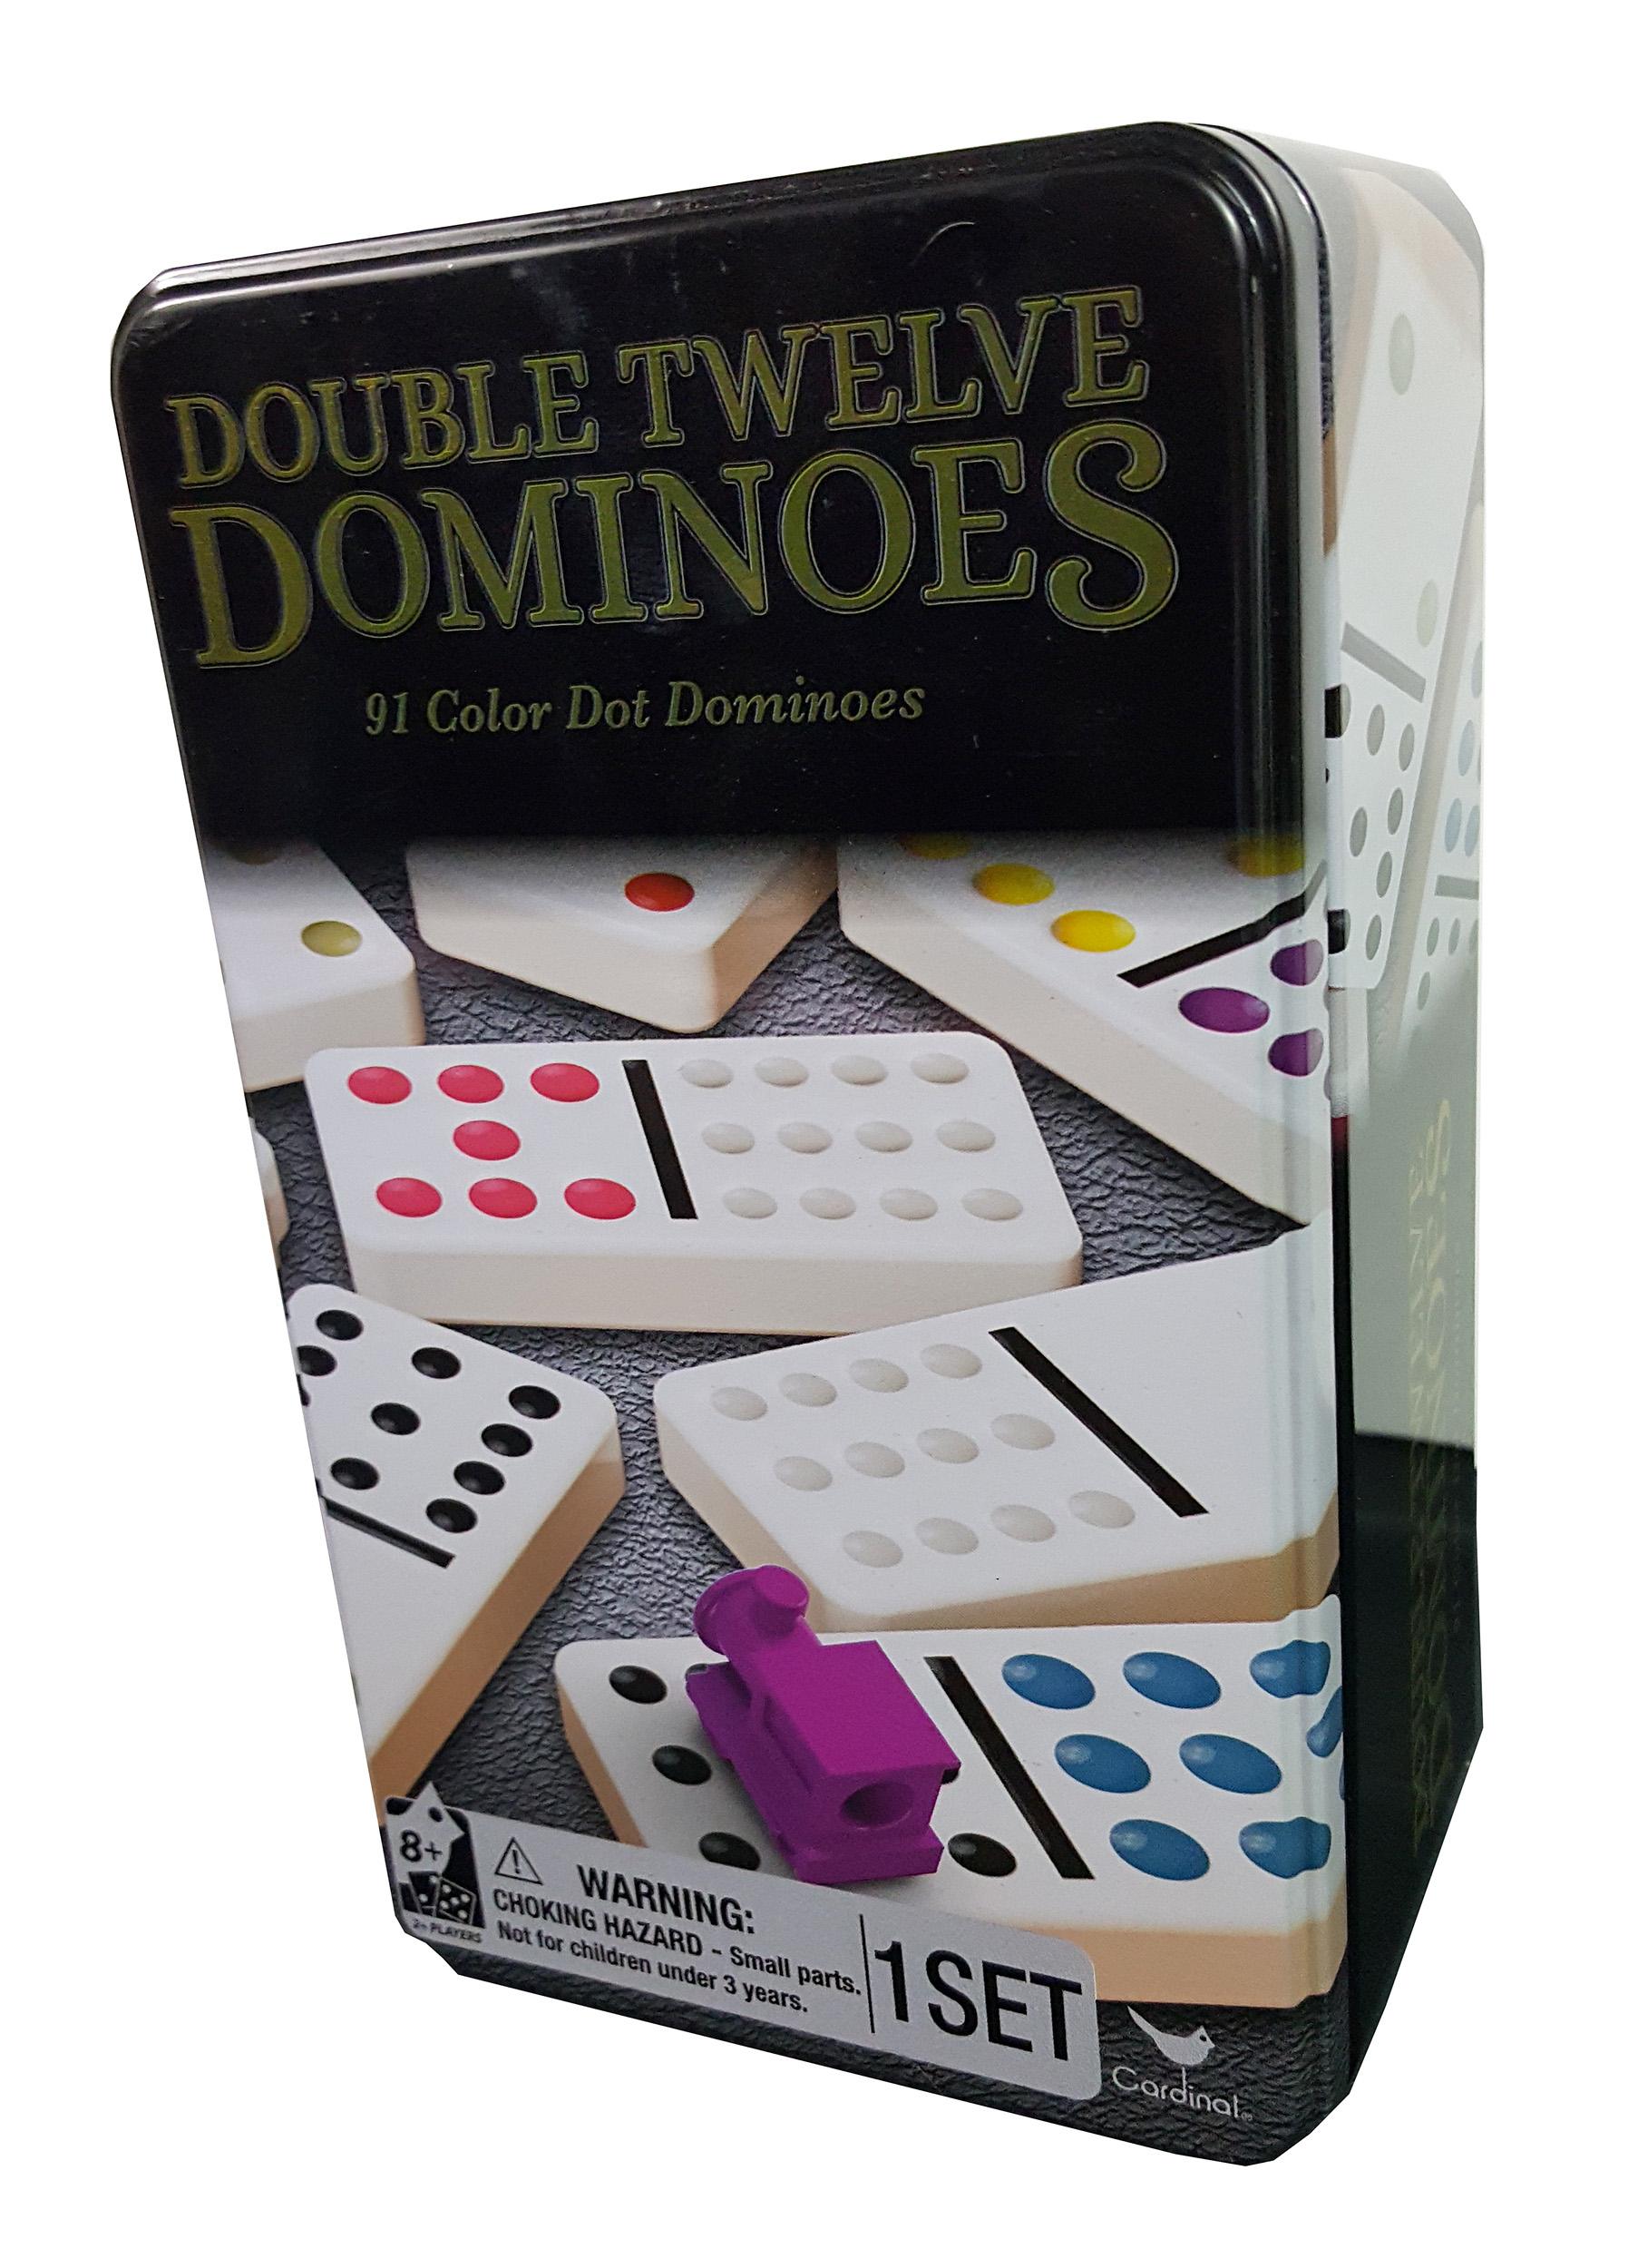 Double Twelve Classic Dominoes professional Set of 91